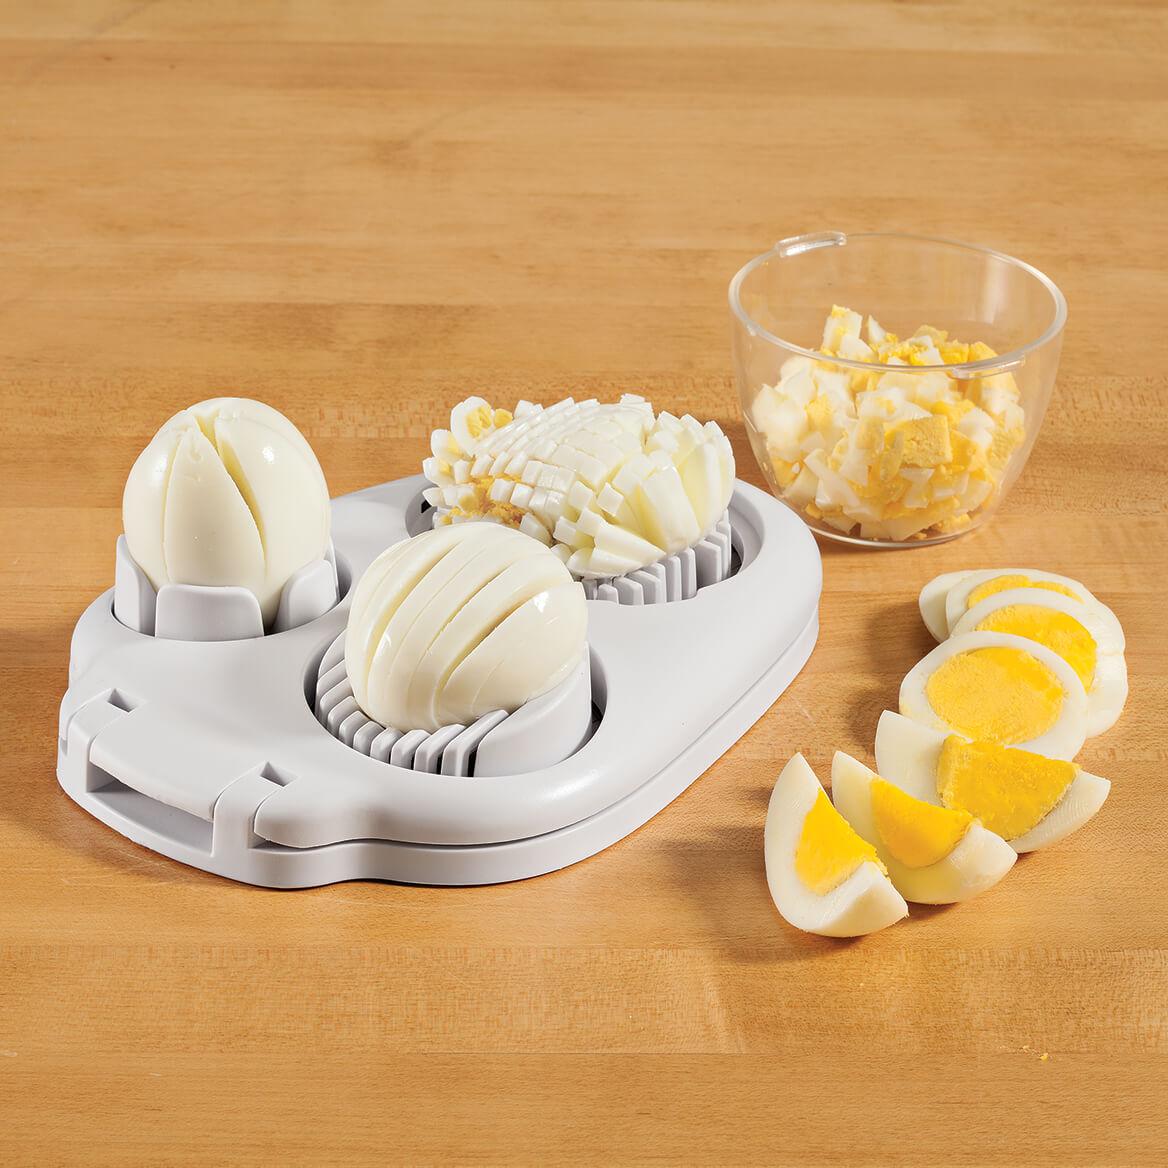 3 in 1 Egg Slicer-362958